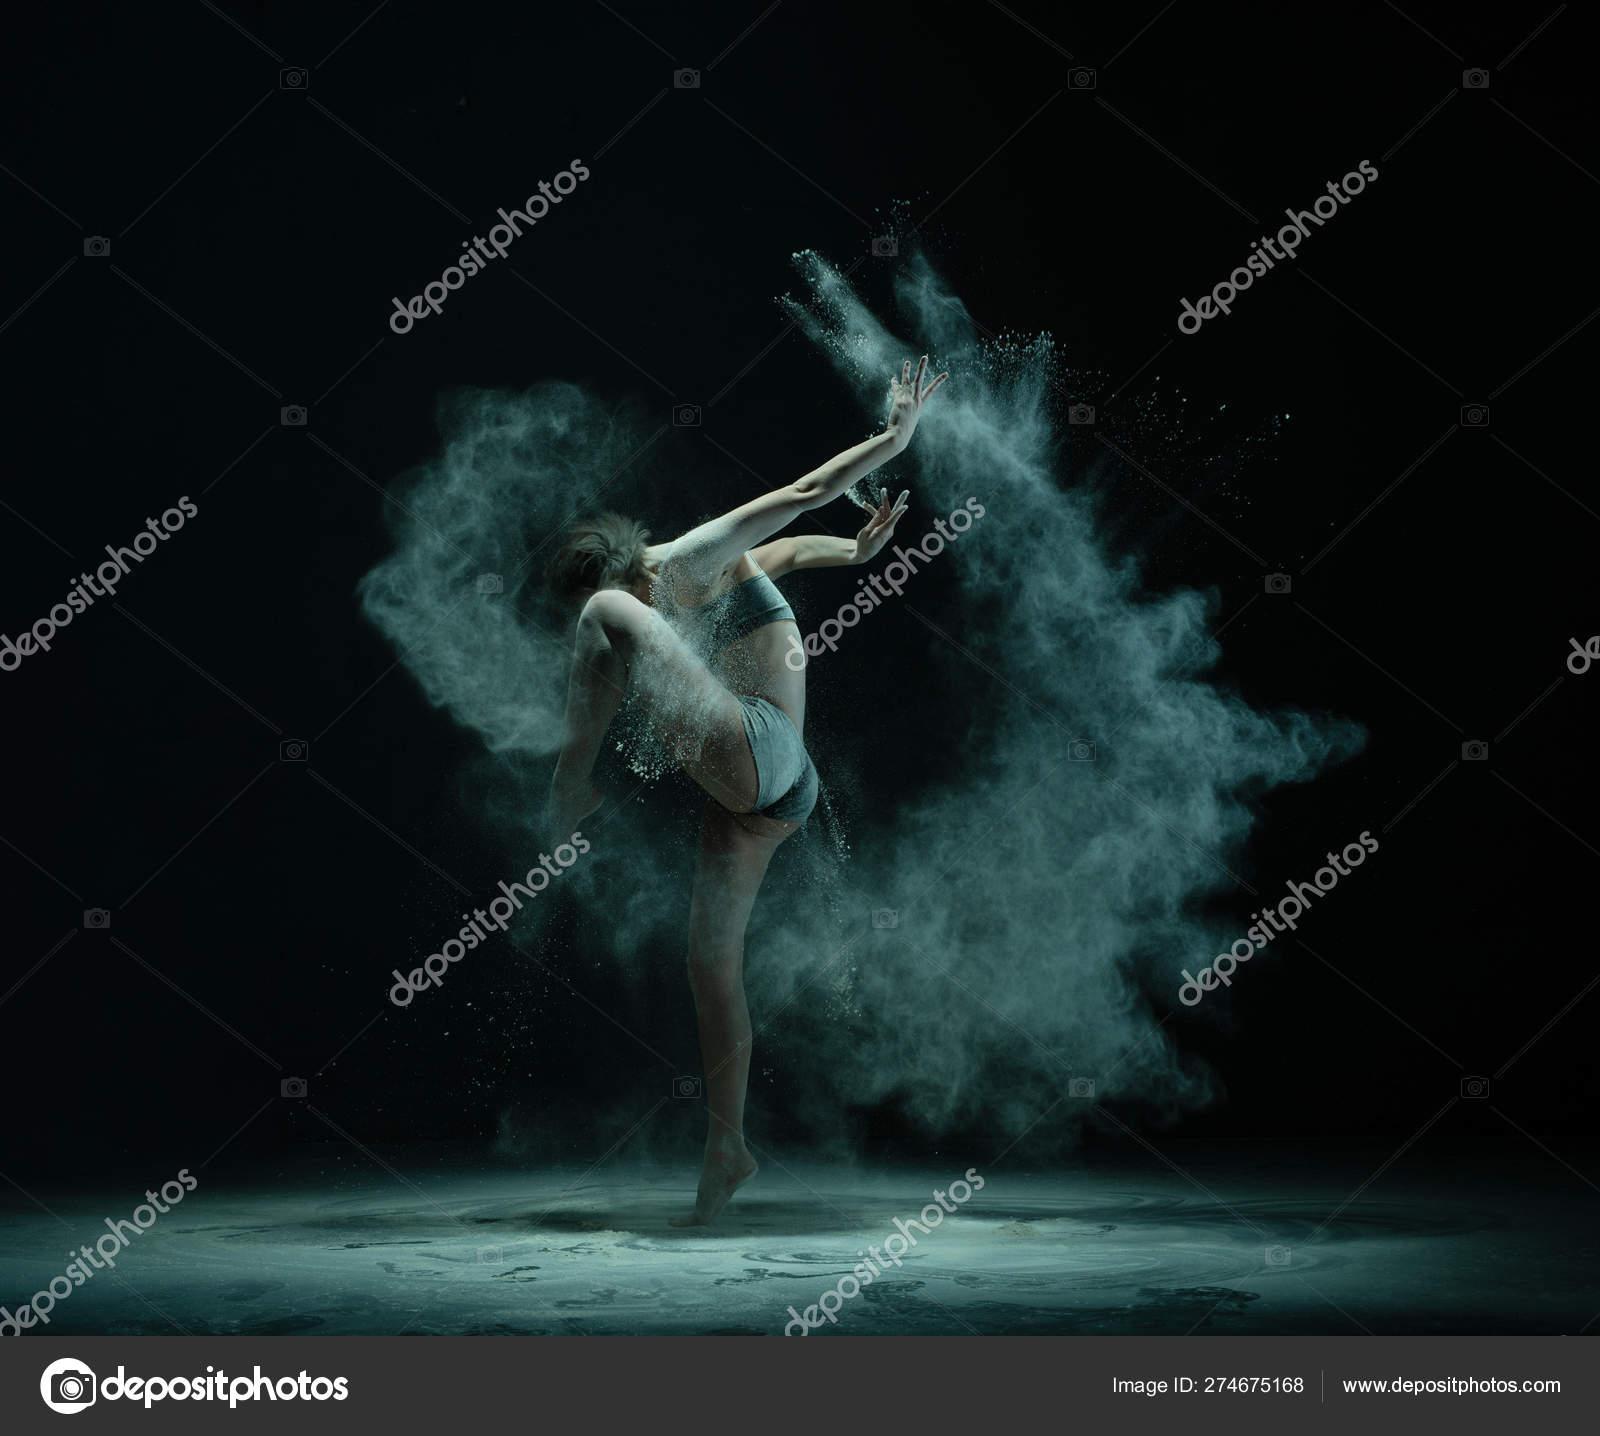 Unduh 5800 Background Anonymous Smoke HD Gratis